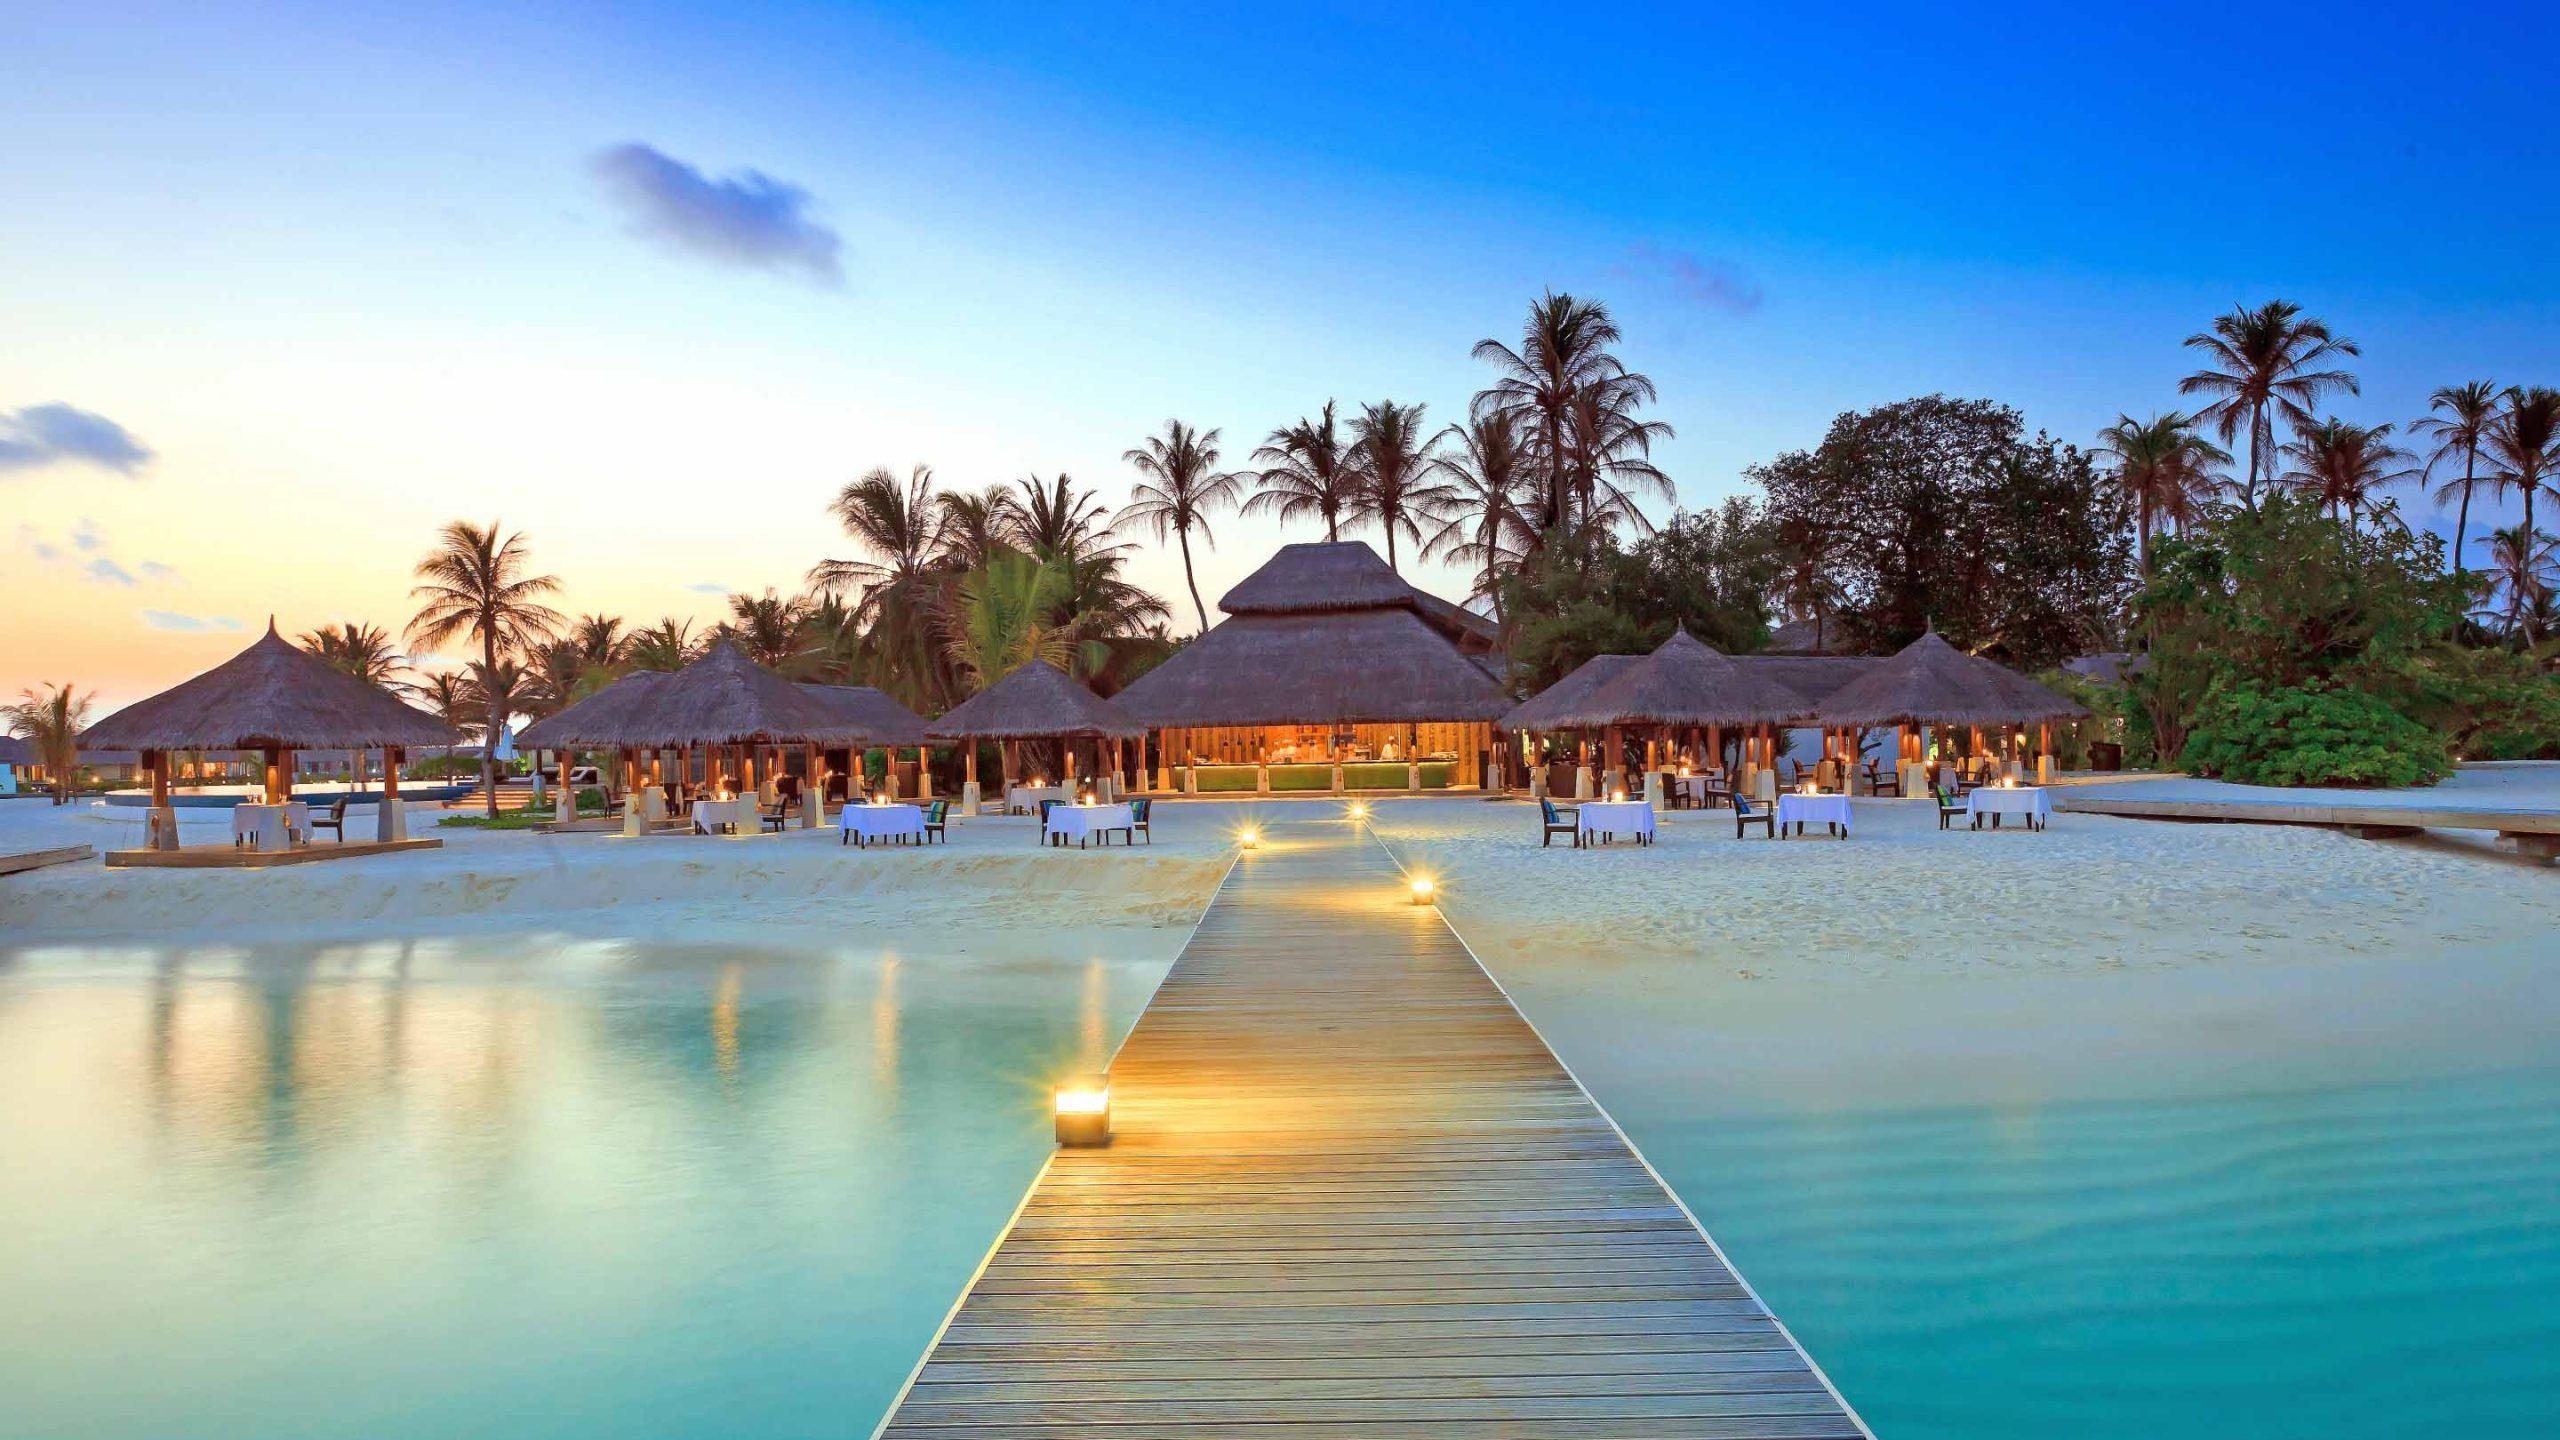 Maldive-Islands-Resort-2560x1600